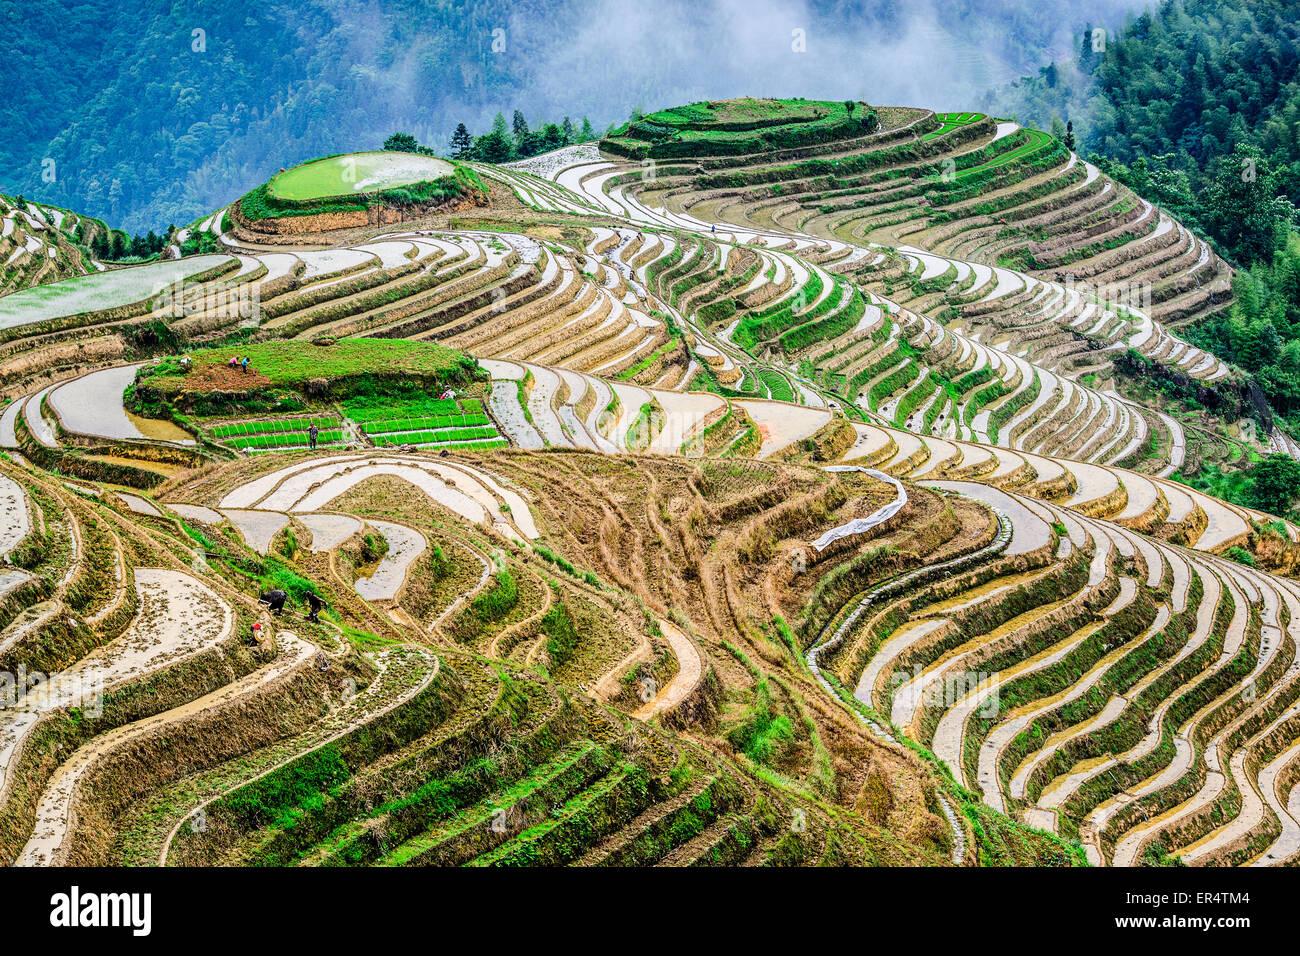 Yaoshan Mountain, Guilin, Chine rizières en terrasses à flanc de paysage. Photo Stock